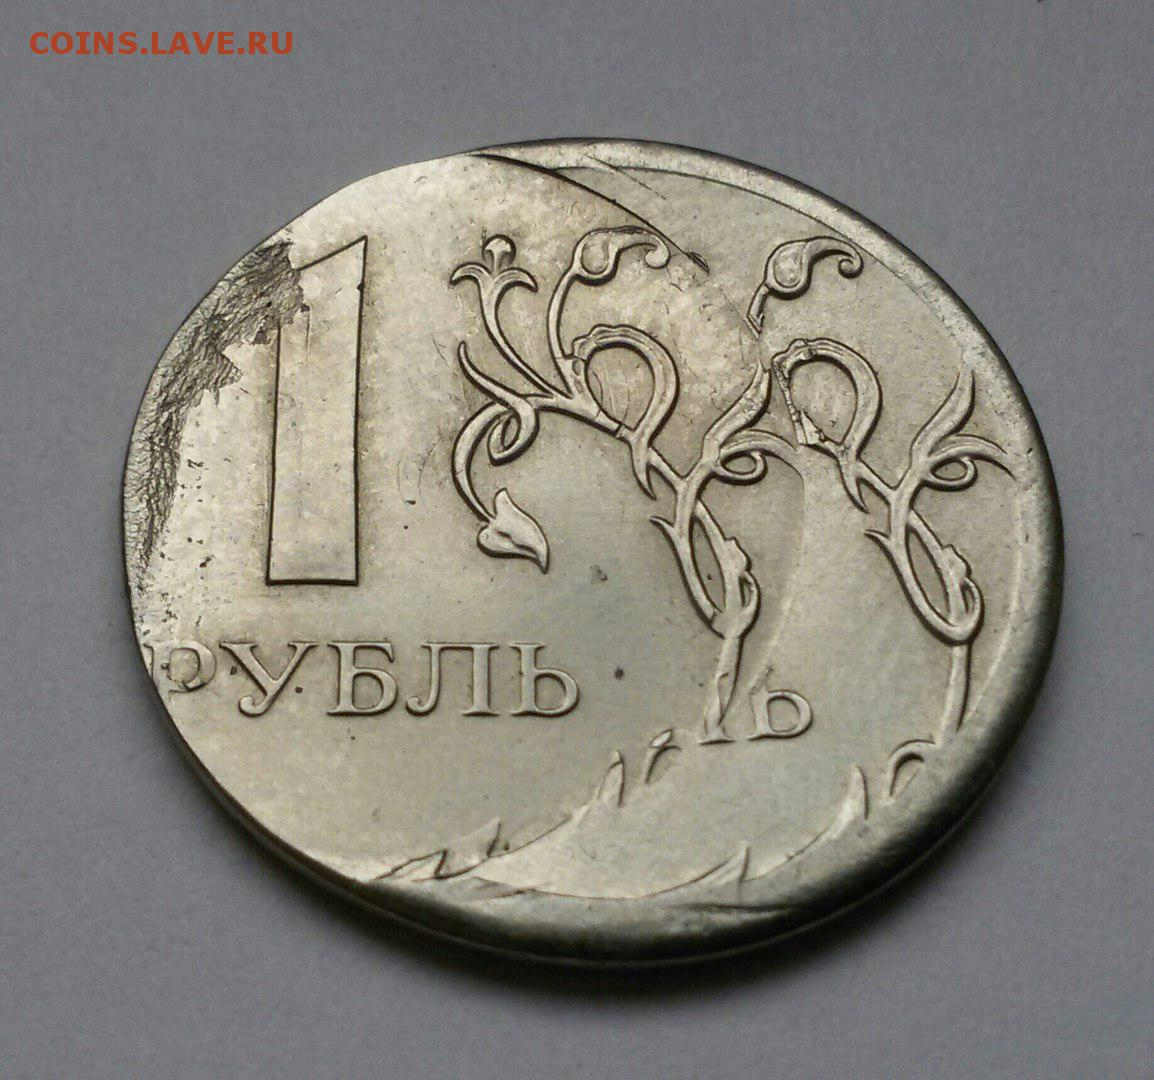 Залипуха coins quarters